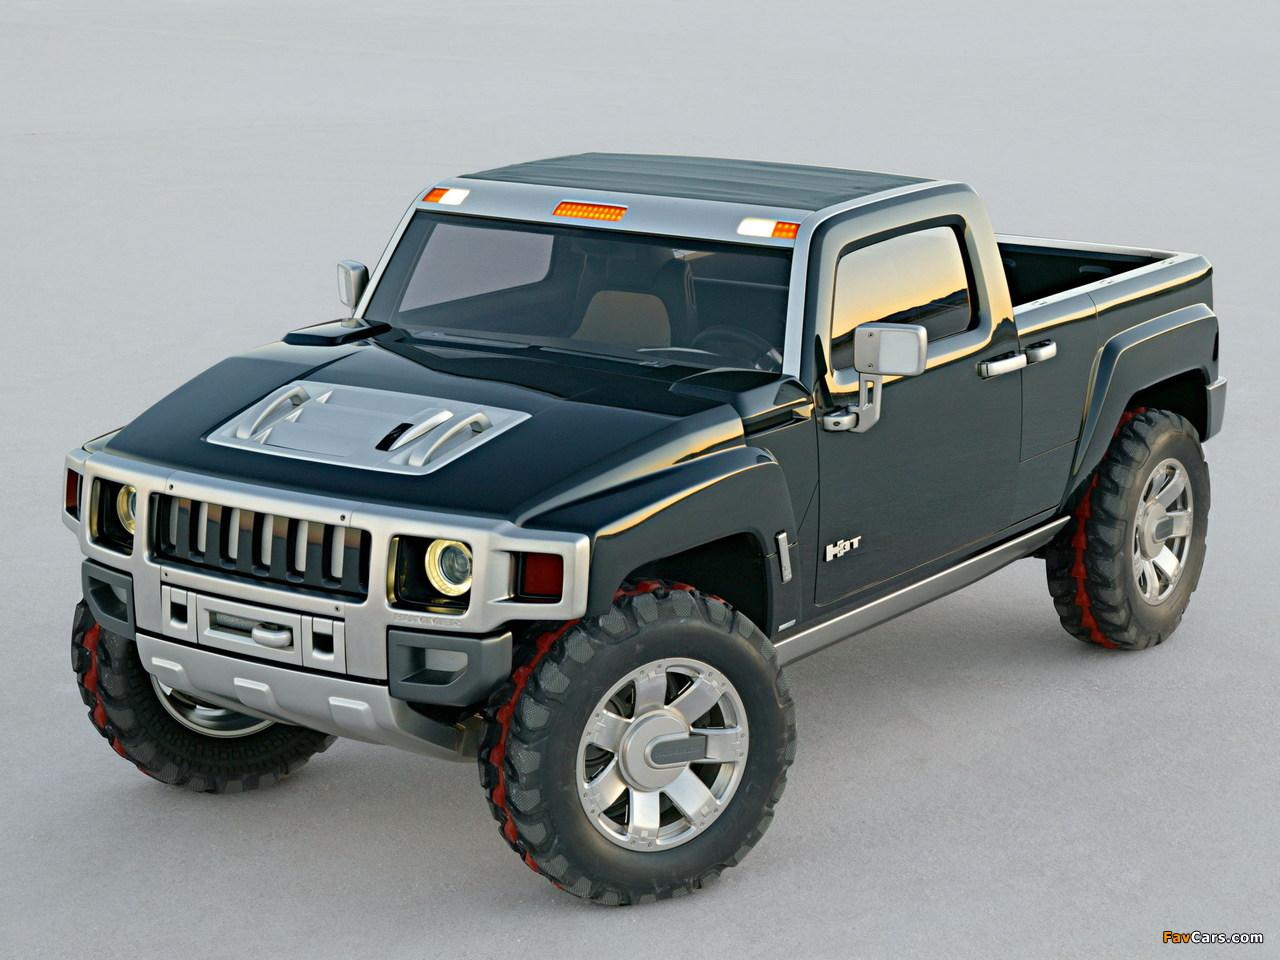 Hummer H3T Concept 2004 images (1280 x 960)